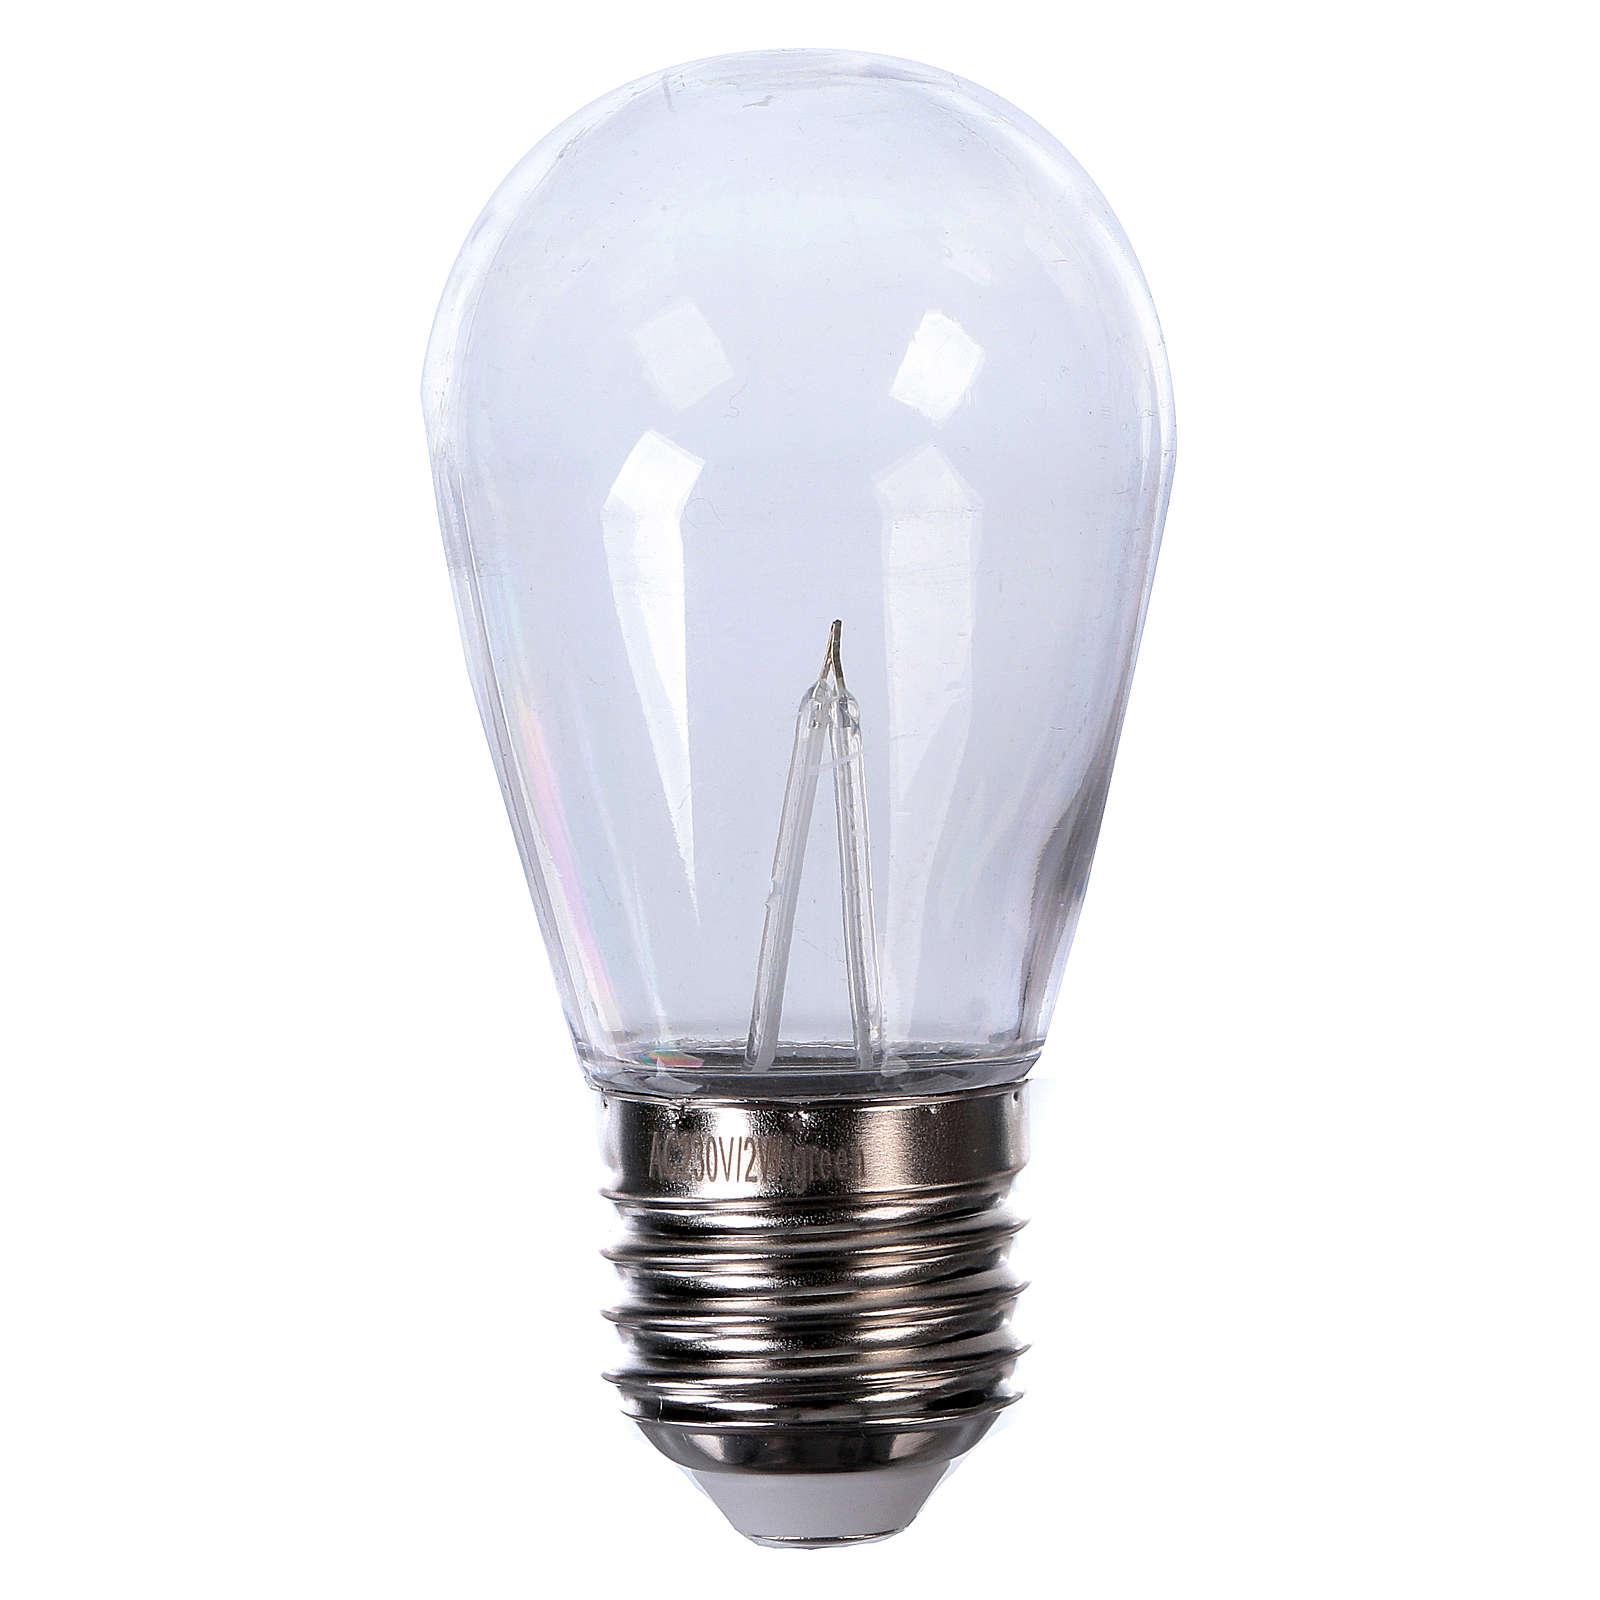 Red drop light bulb E27 for lamp holder chains 3